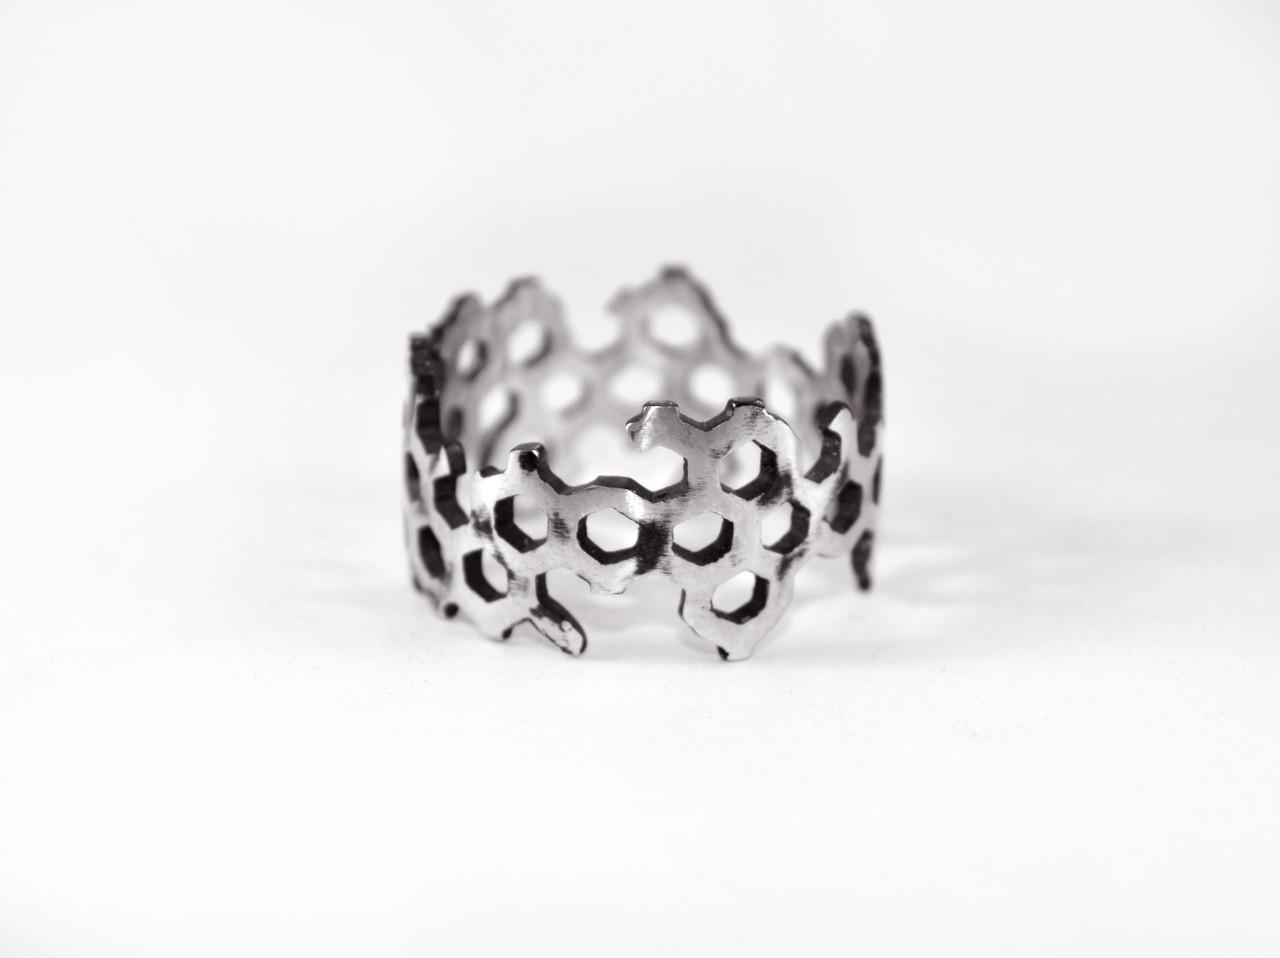 Кольцо из серебра EJ Structure Размер 18.5